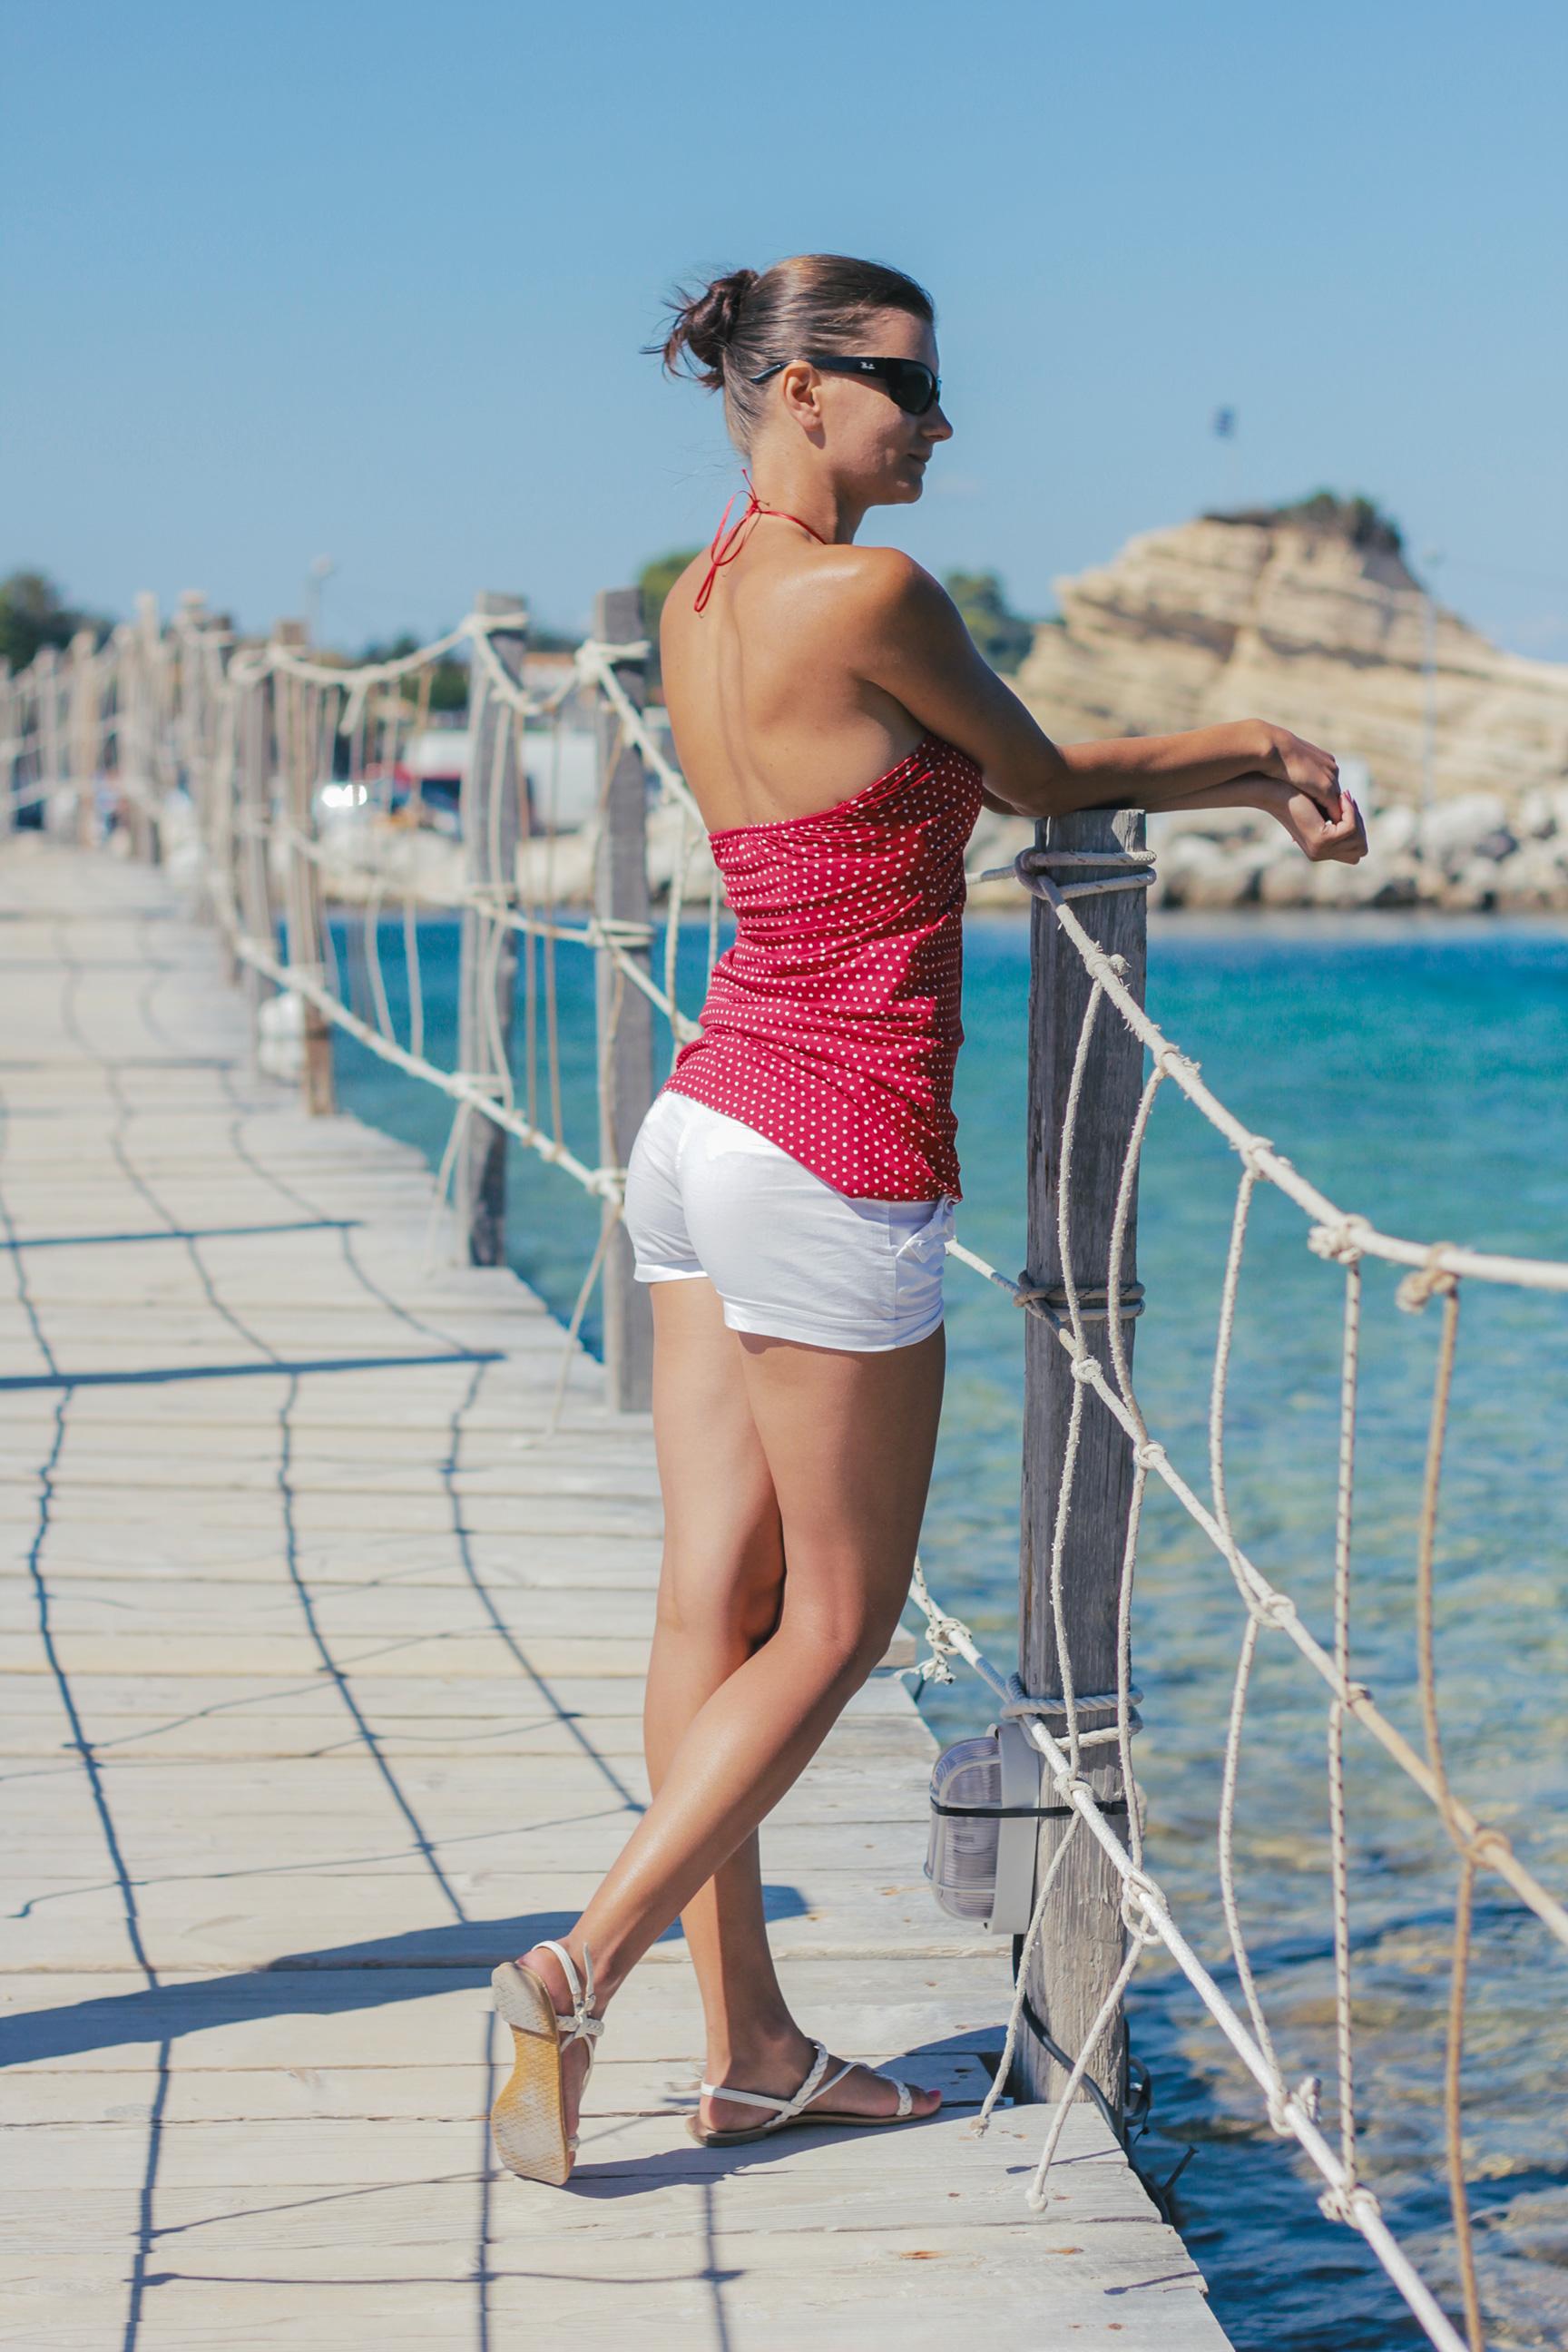 Download Car Wallpapers For Laptop Free Stock Photo Of Beach Beautiful Bikini